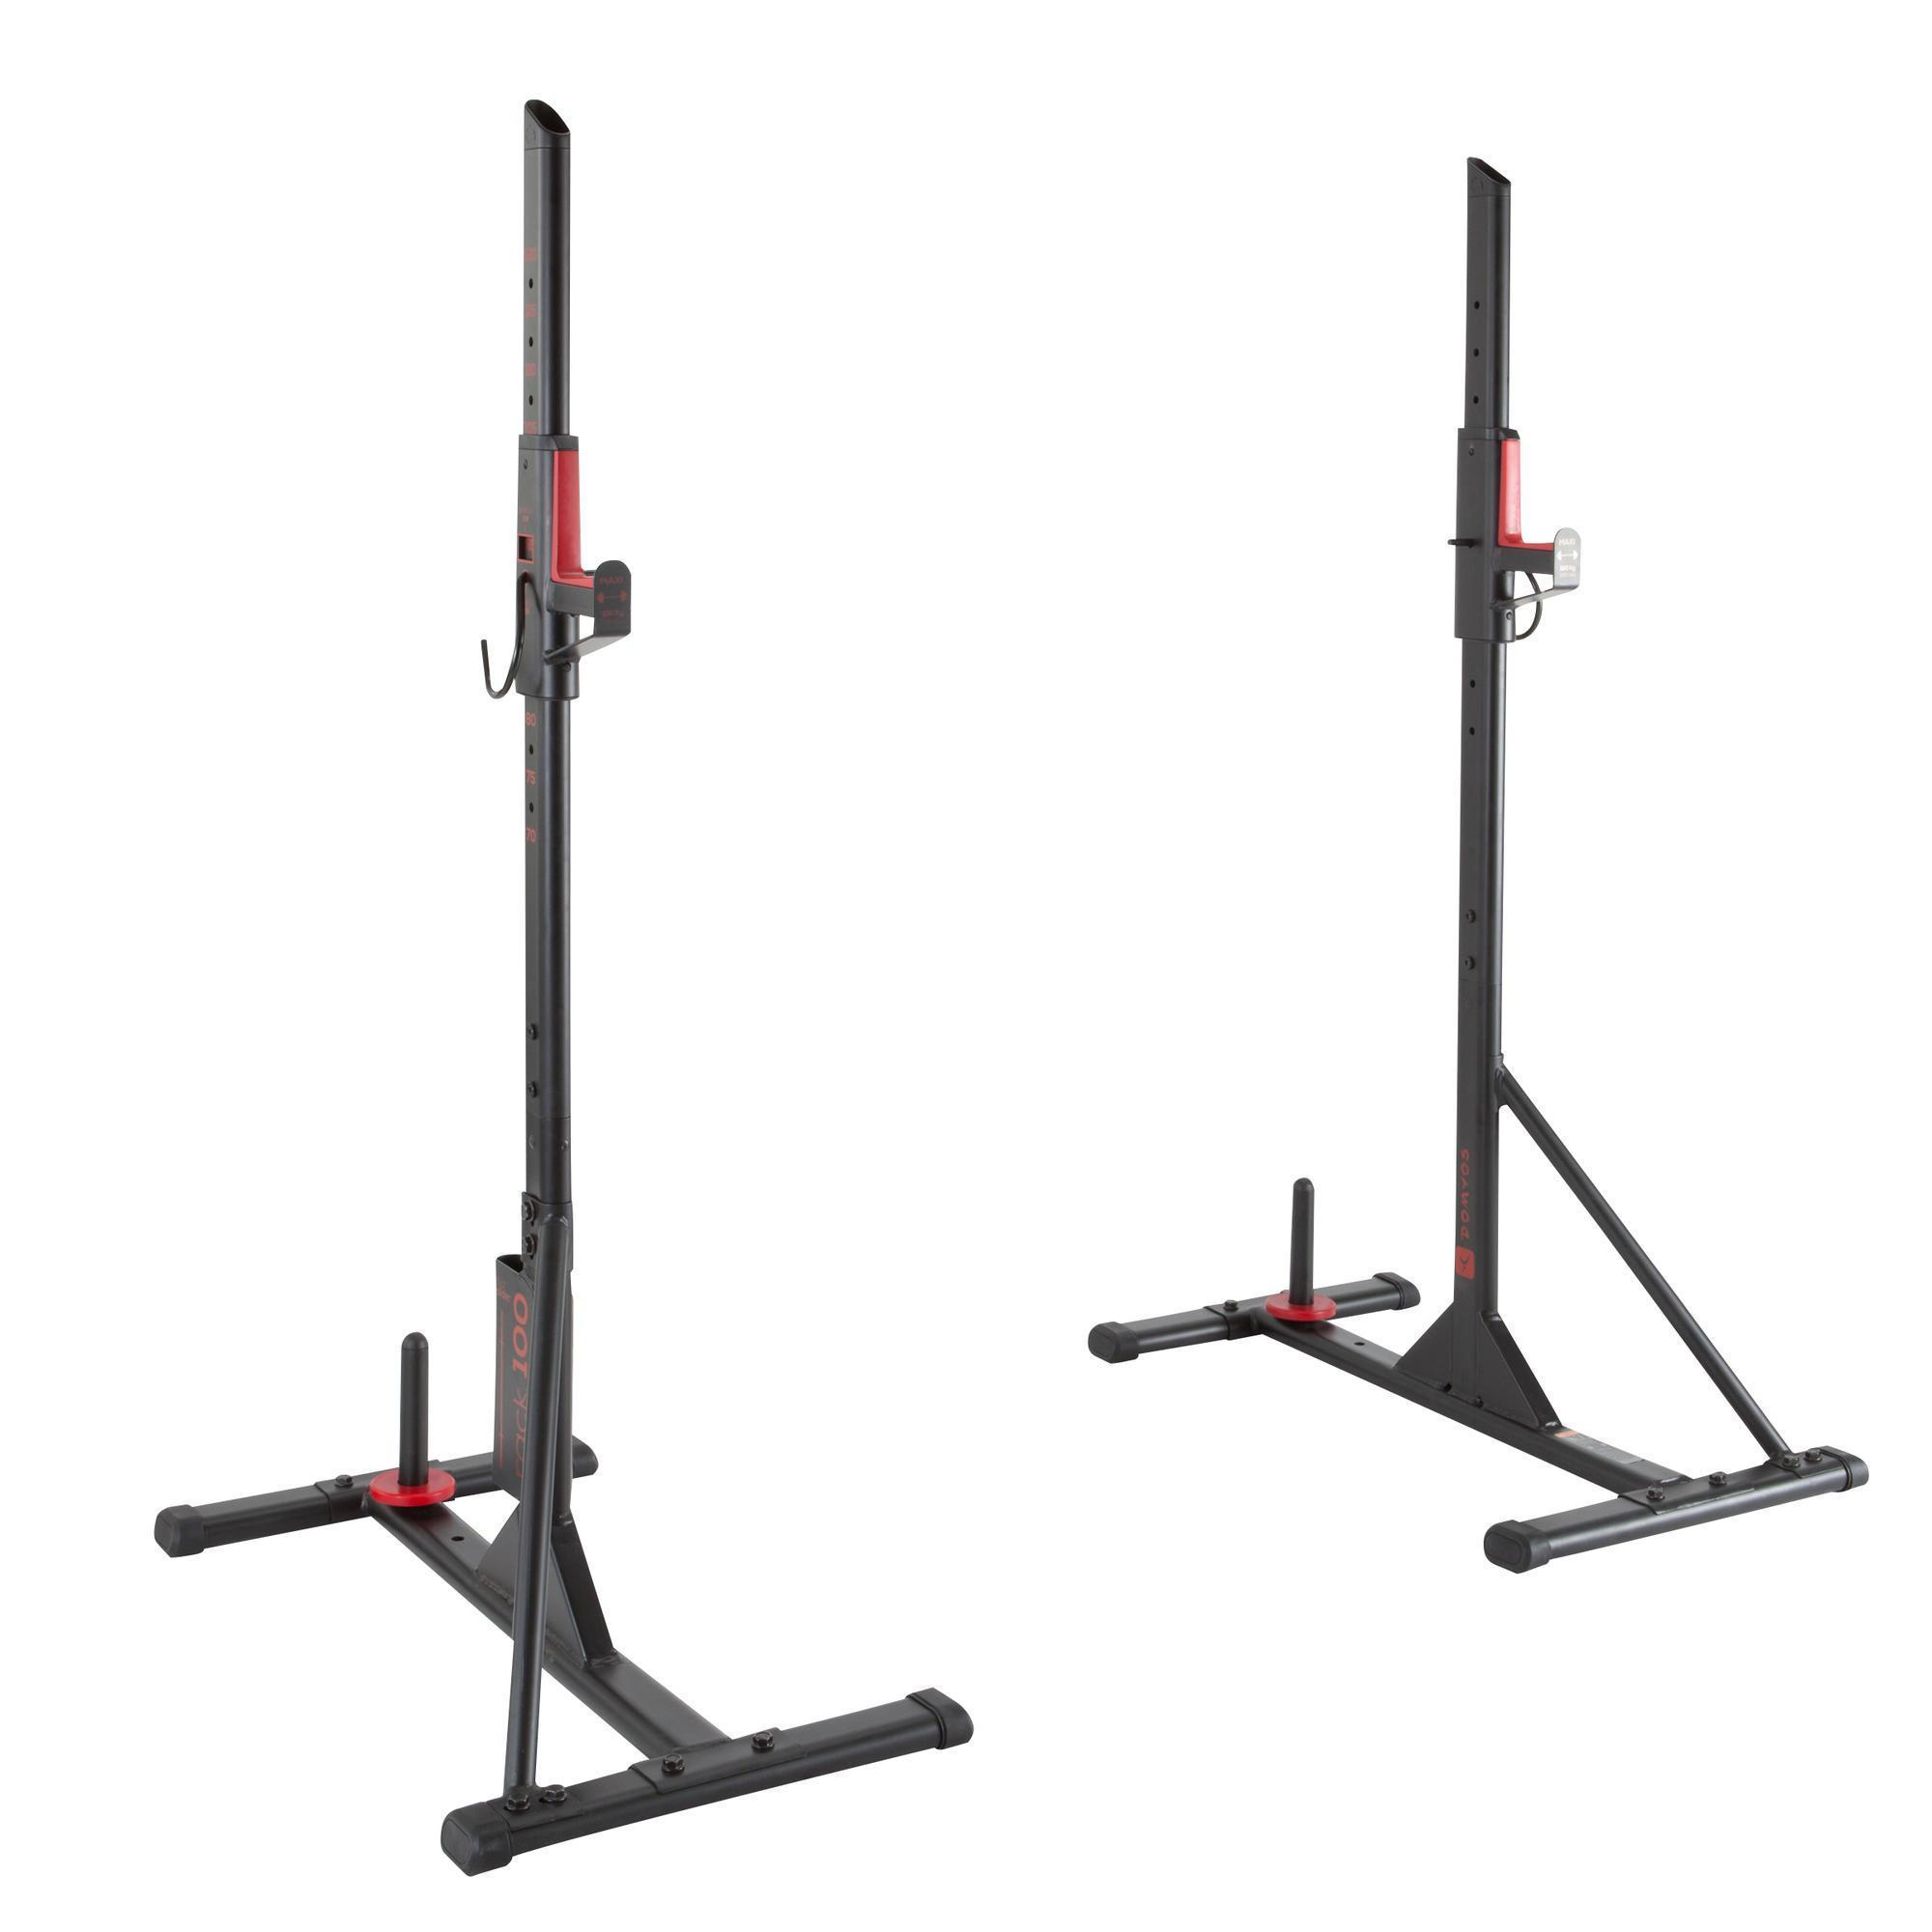 6 Exercices Avec Banc De Musculation Musculation Cross Training